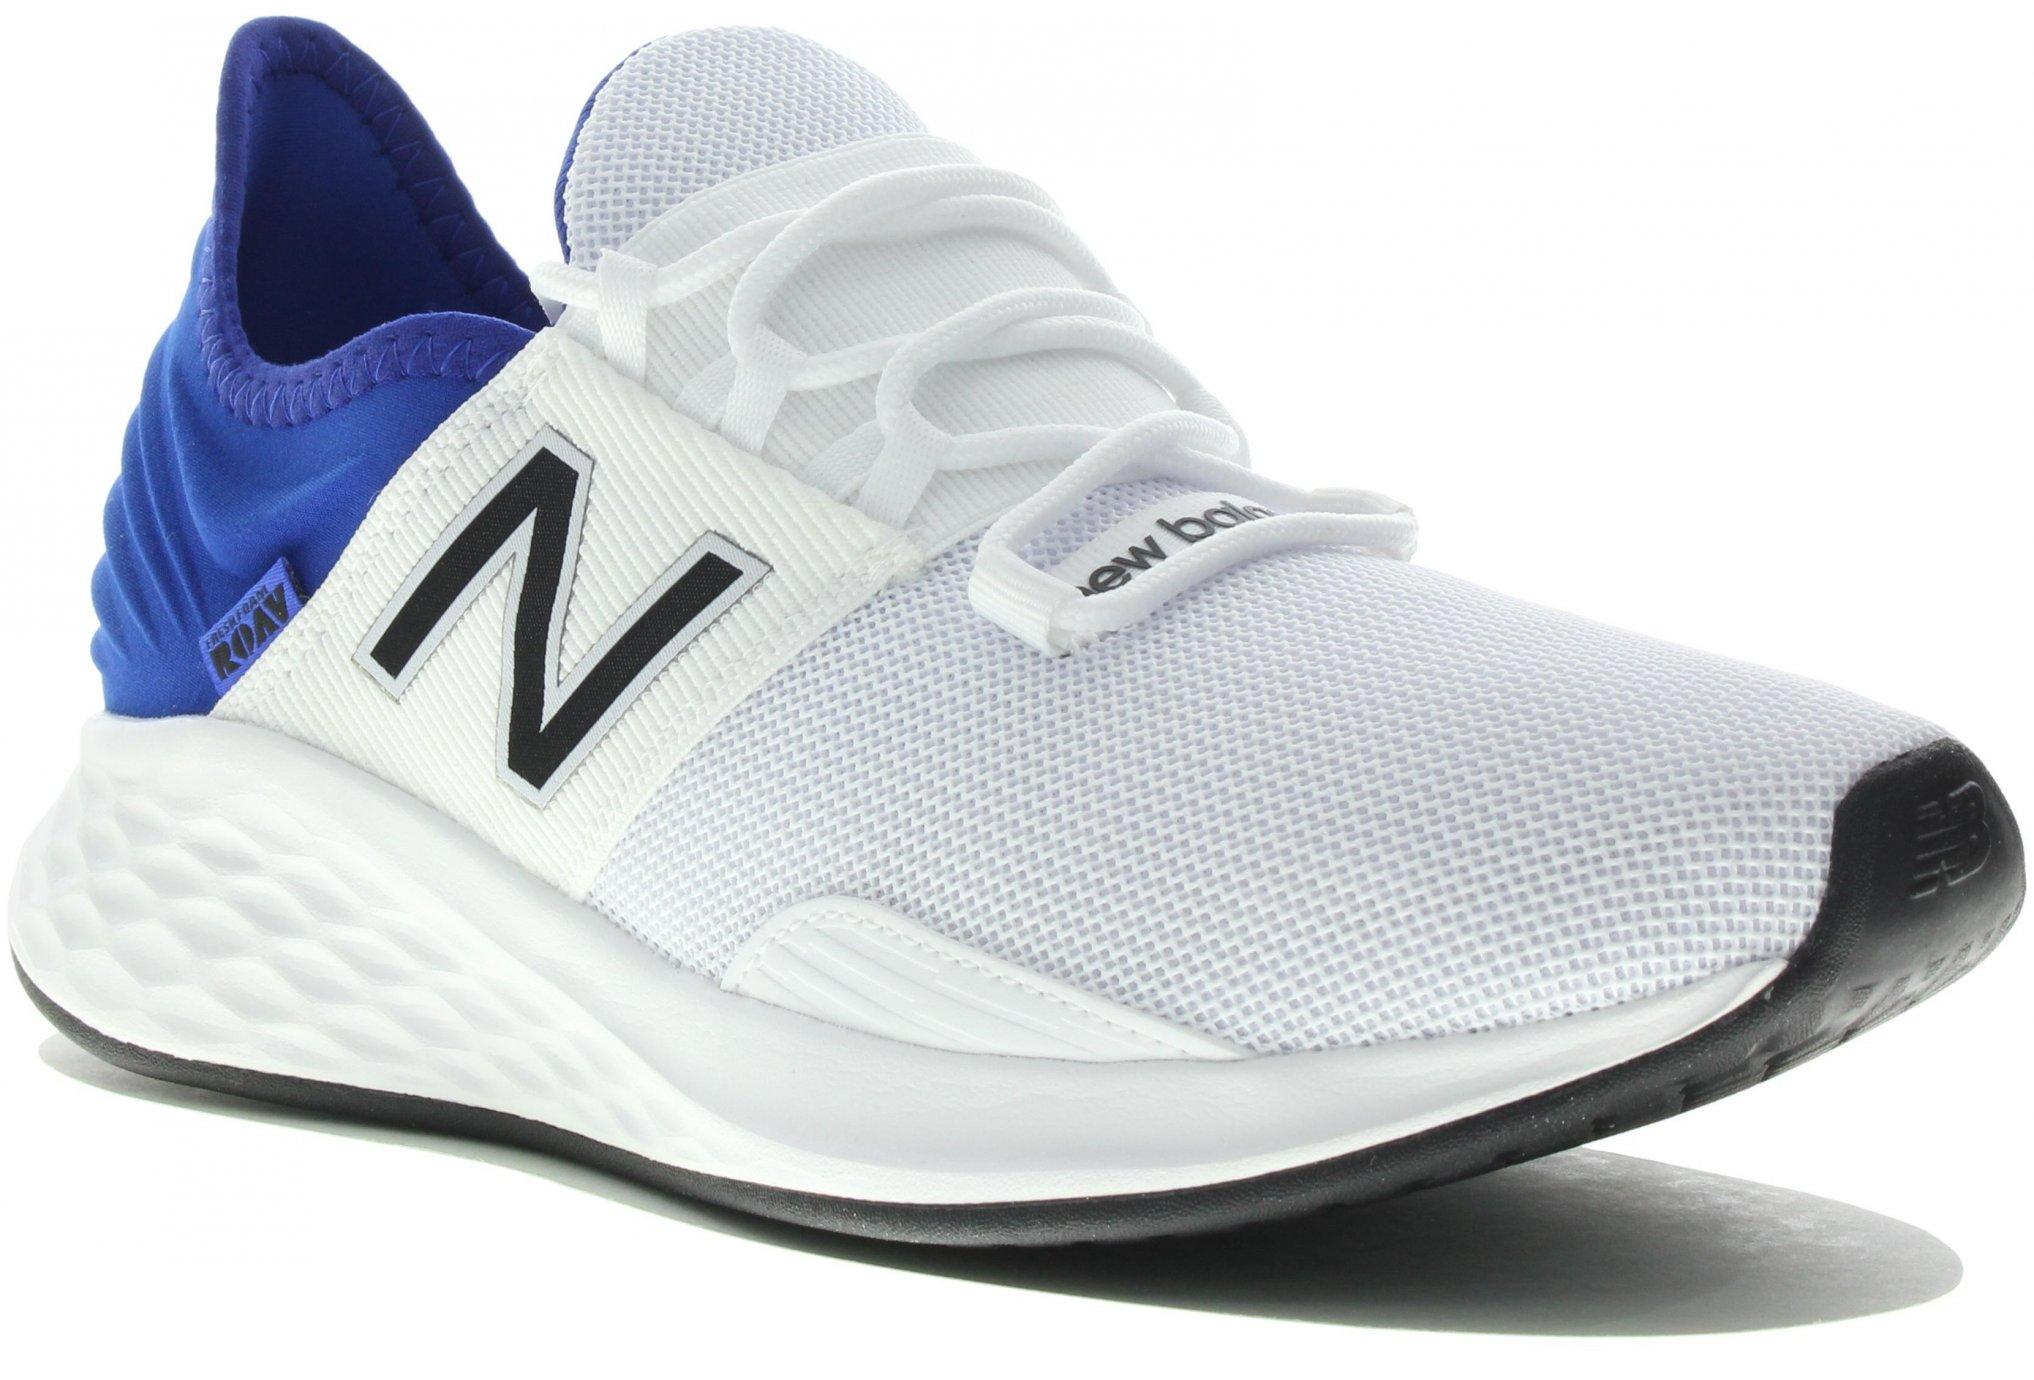 New Balance Fresh Foam Roav Chaussures homme